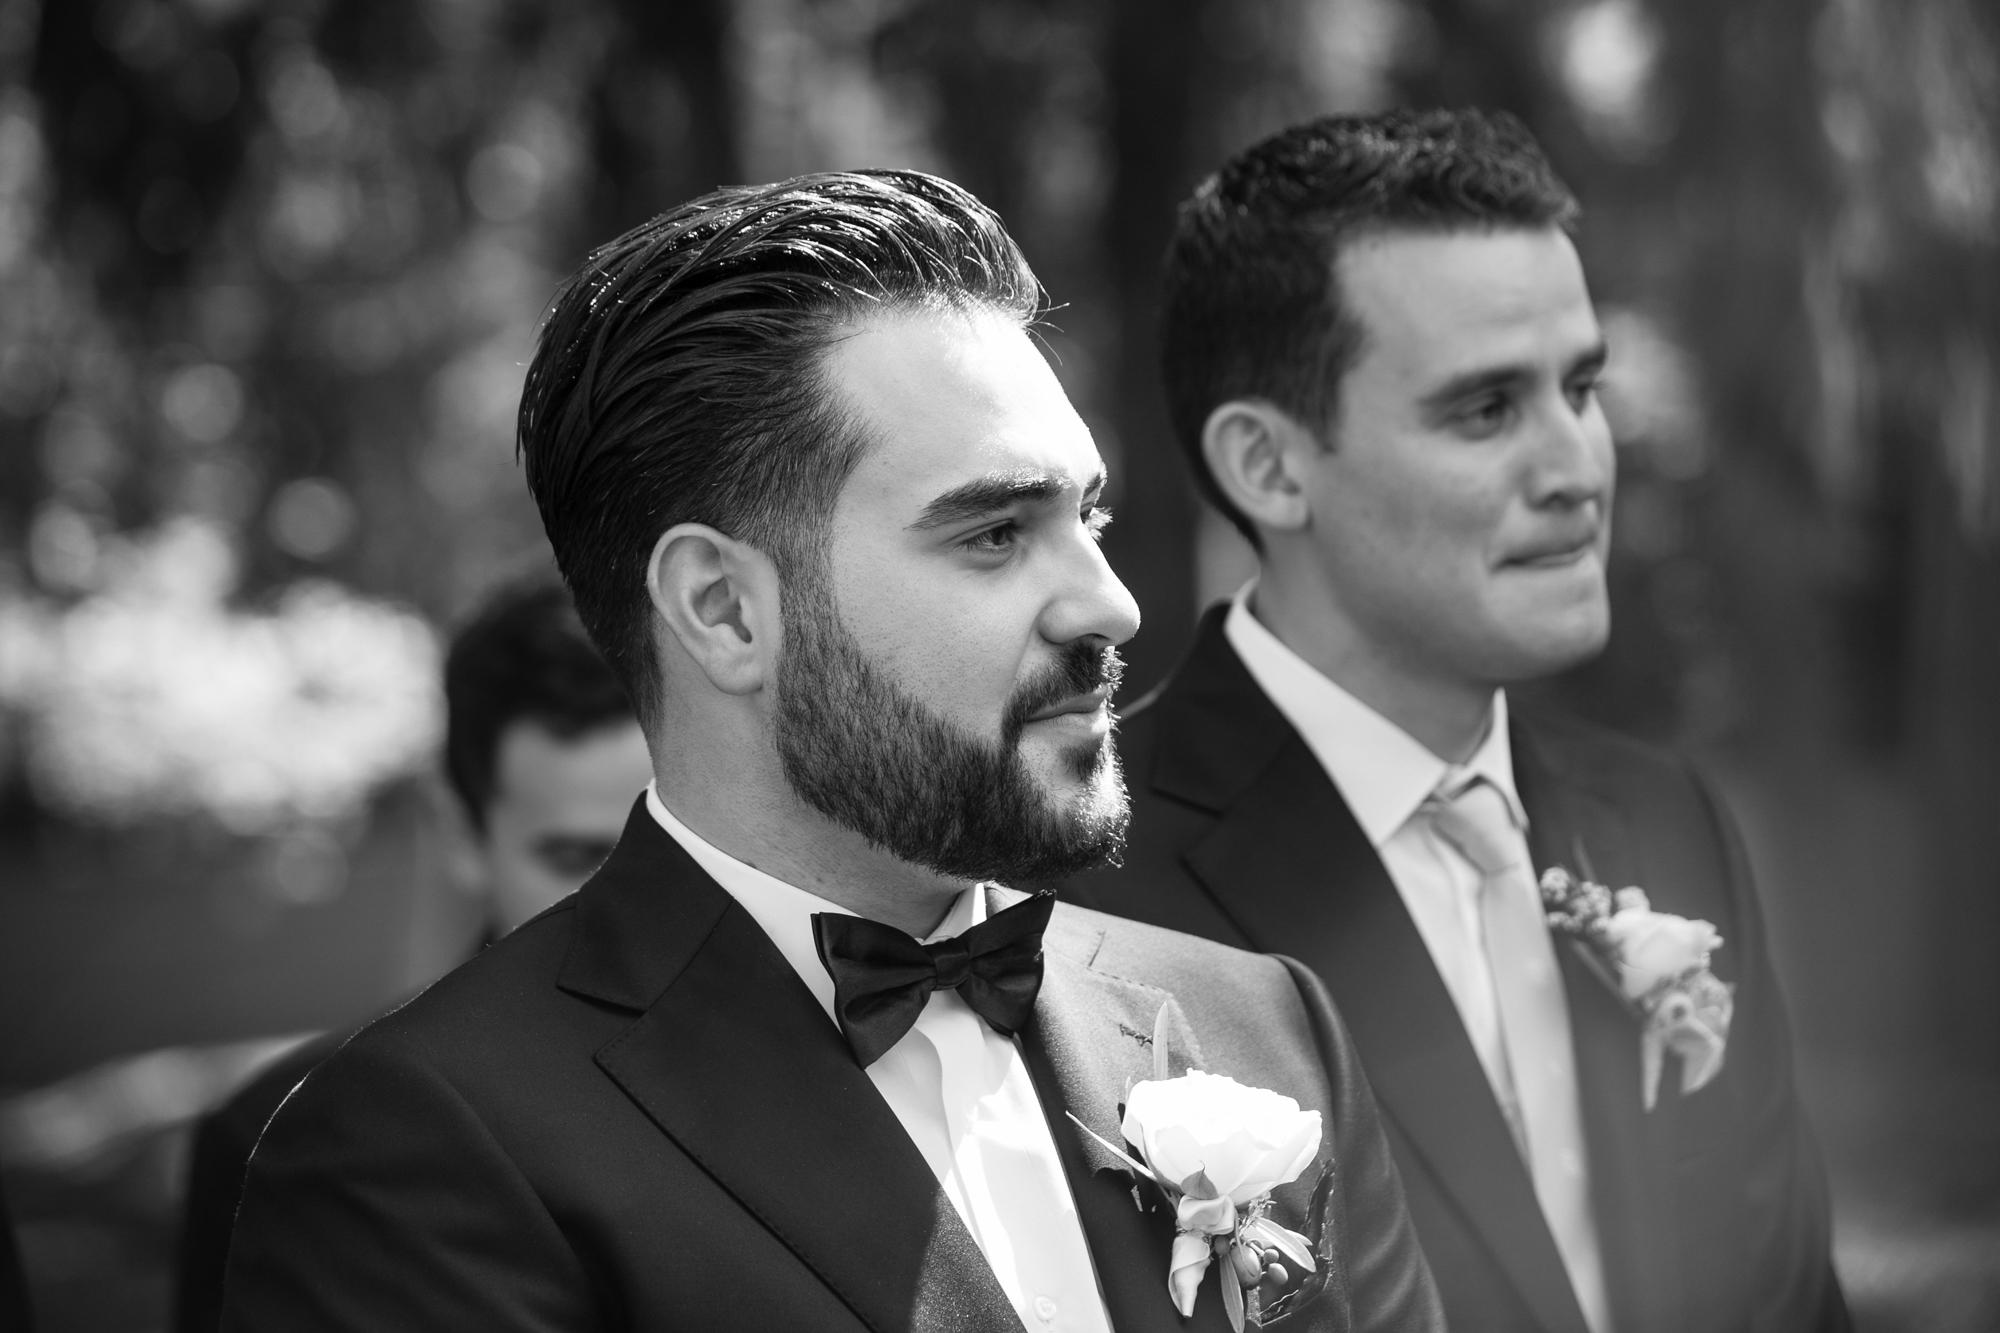 greek-wedding-salt-lake-city-utah-15.jpg